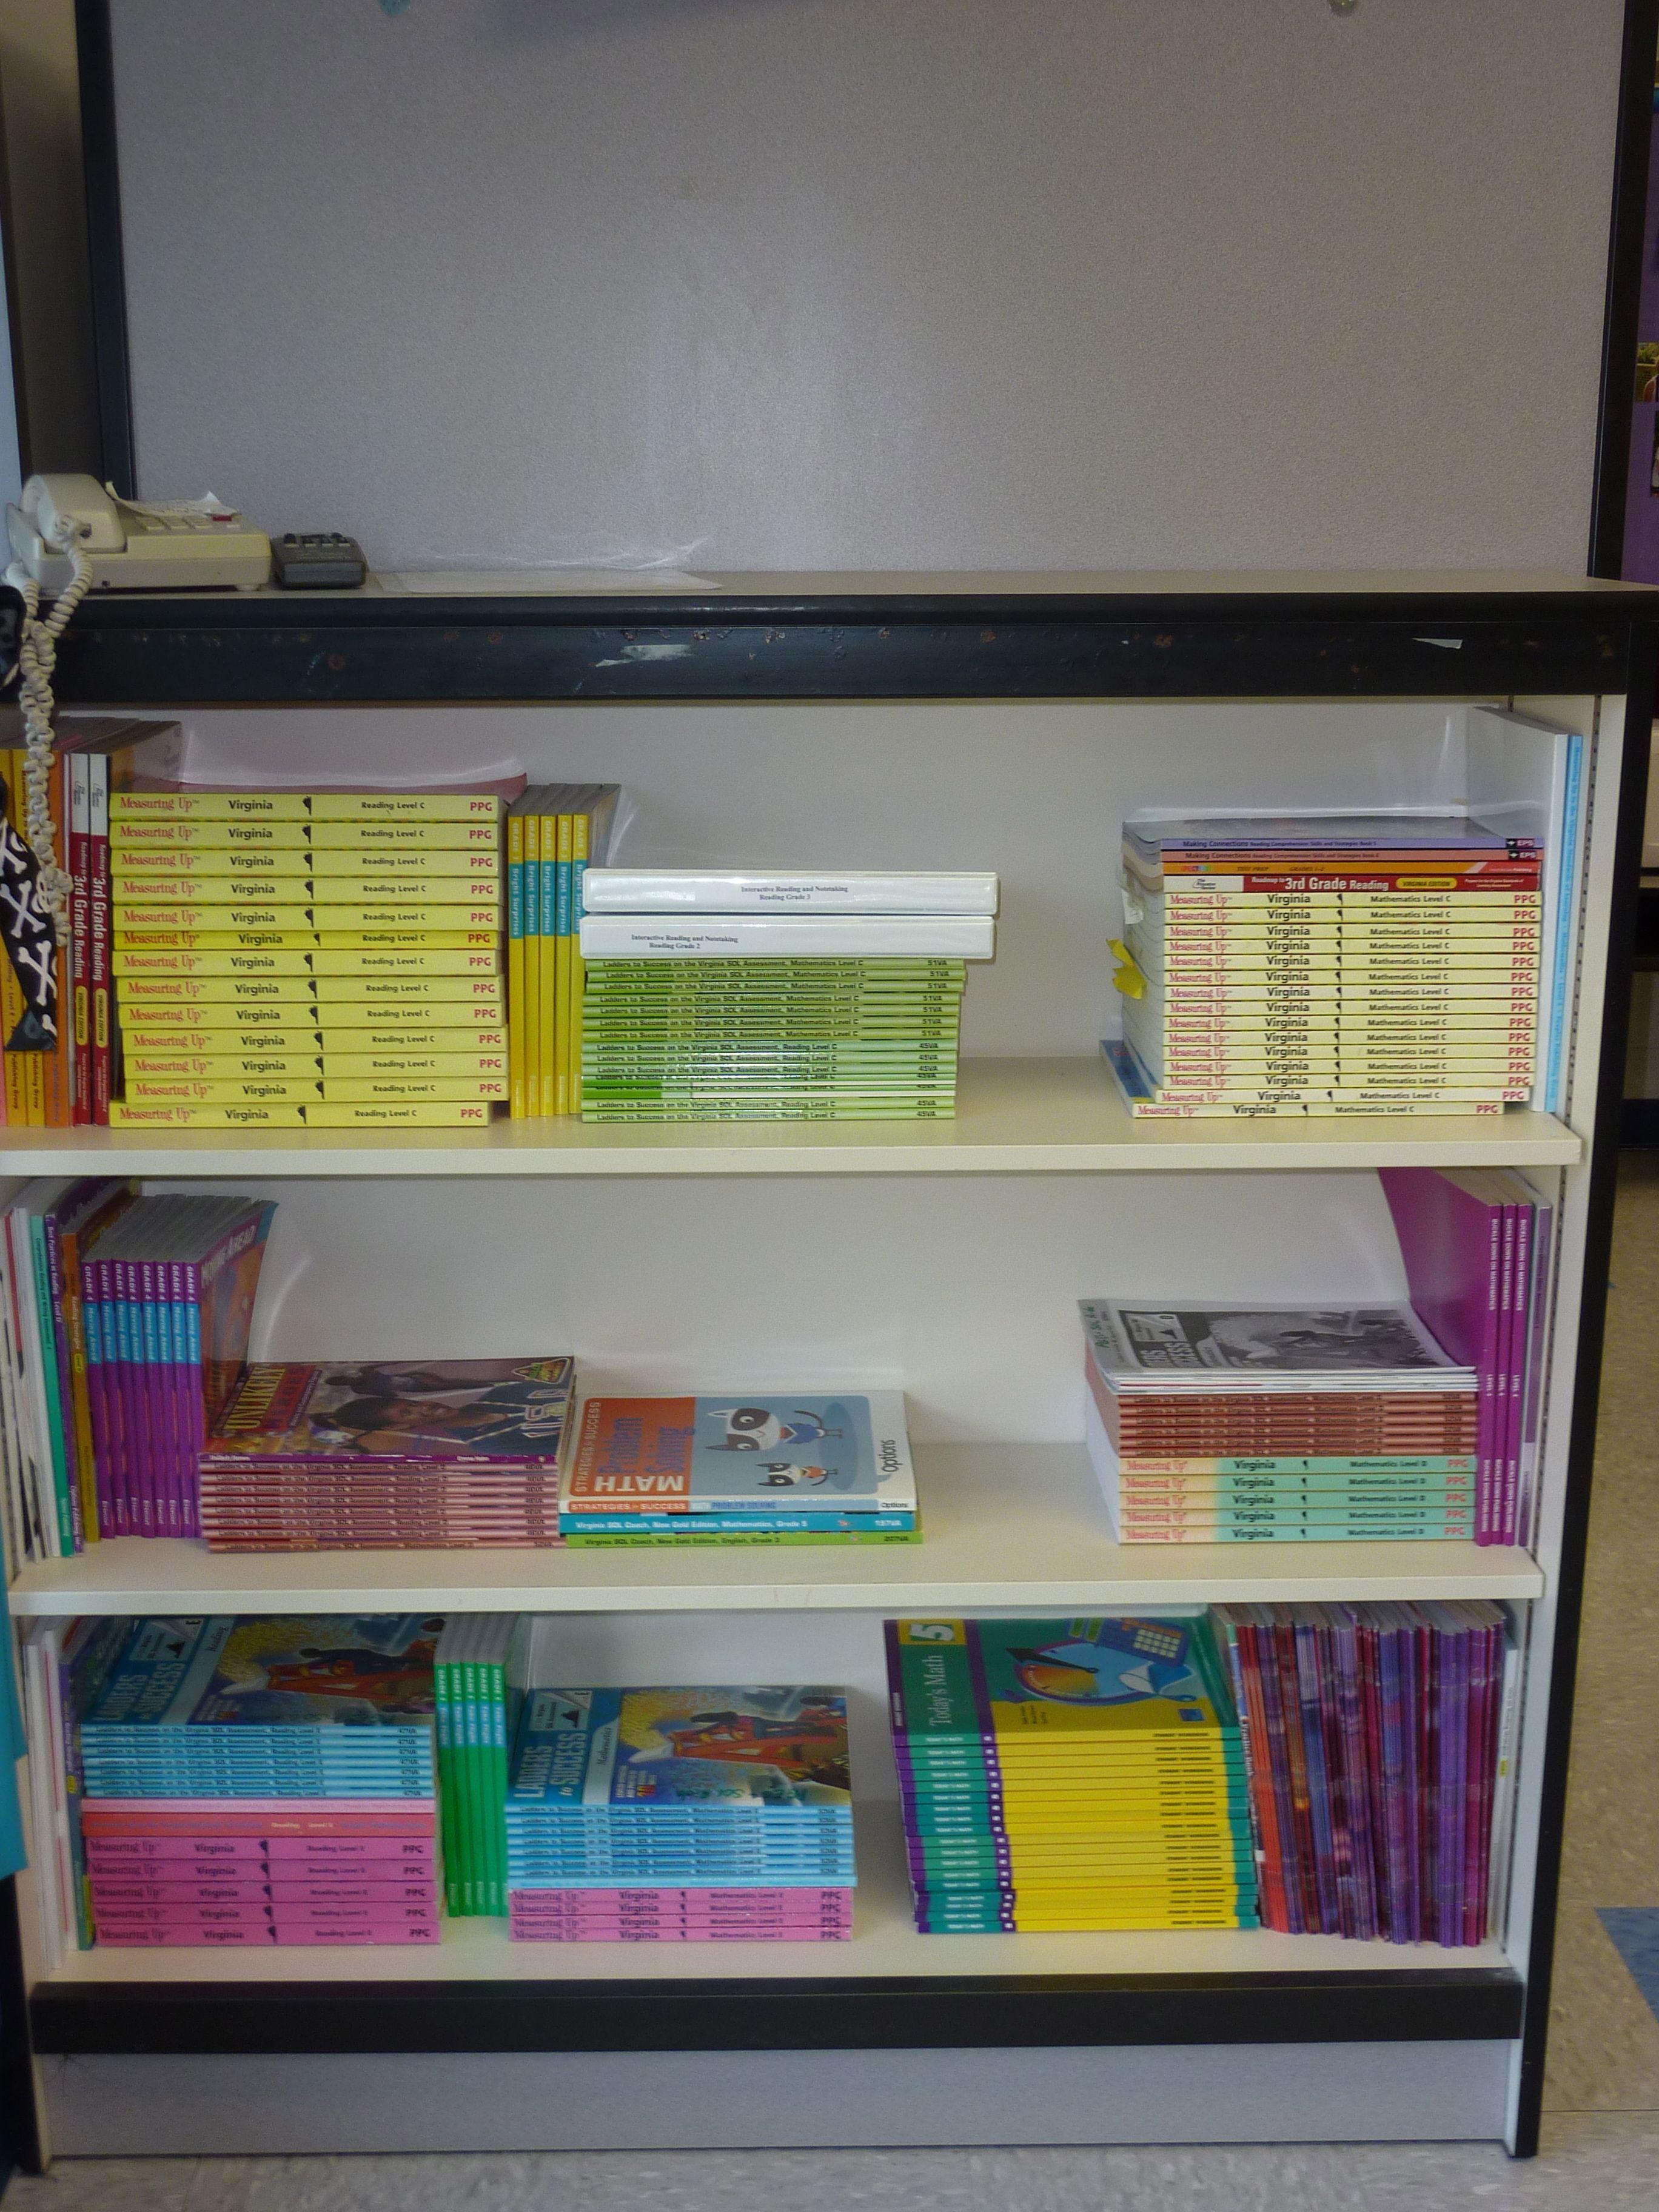 Classroom Bookcase Ideas : Classroom bookshelf ideas images back to front